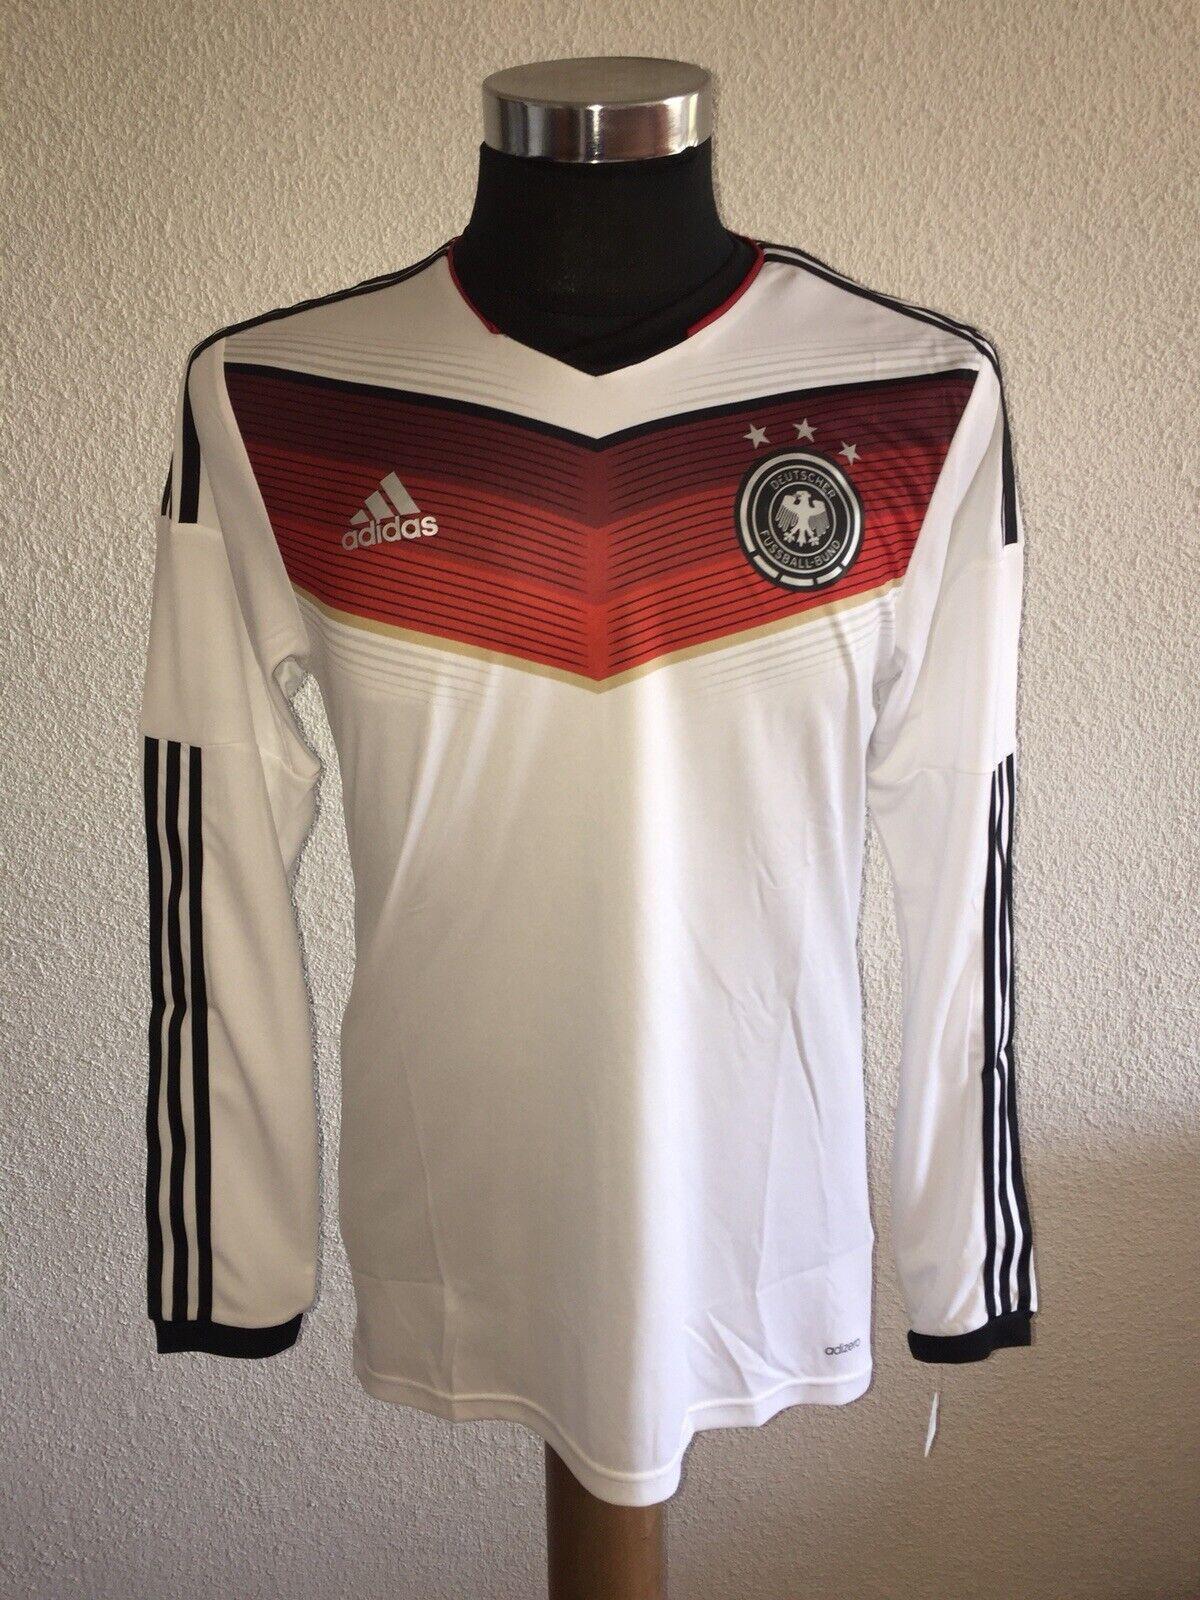 Germany Alemania 2014 Adizero Player Issue No Match Worn - Talla 8 -